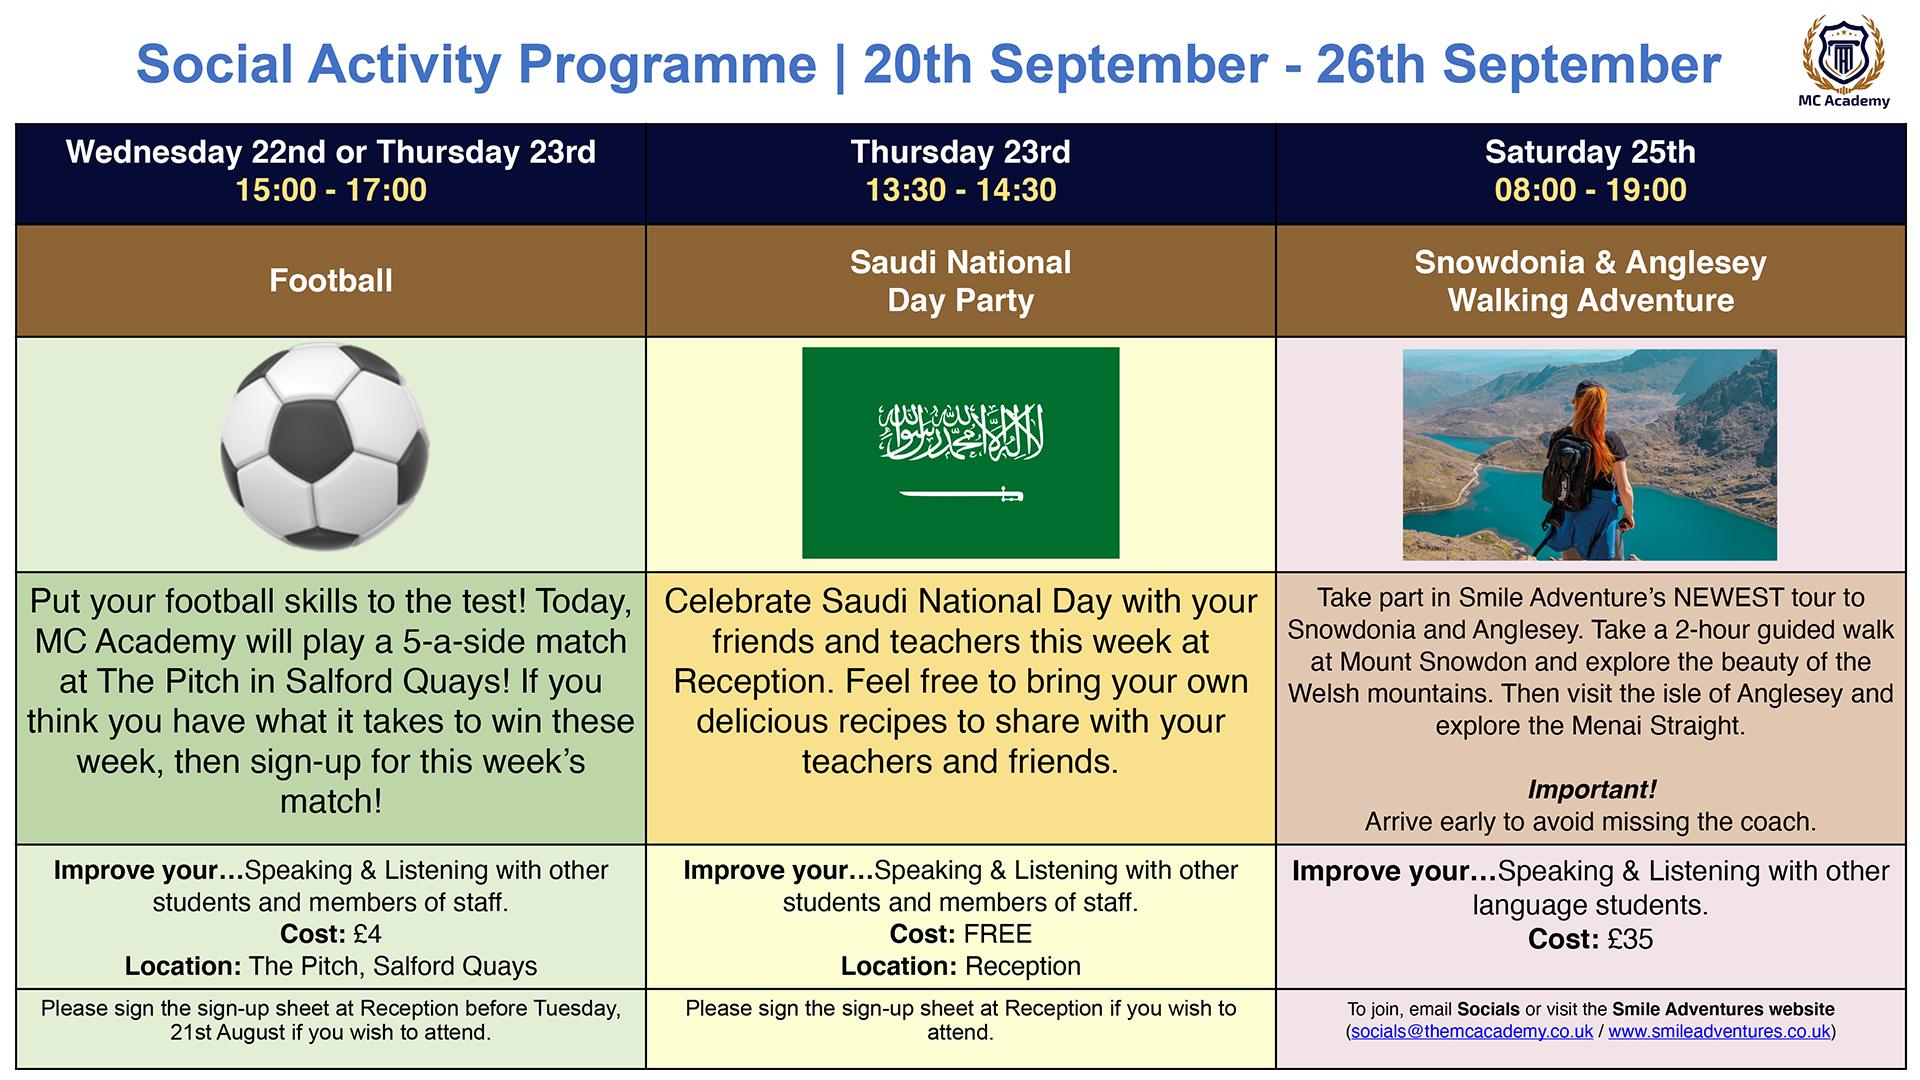 Activities 20th September - 26th September